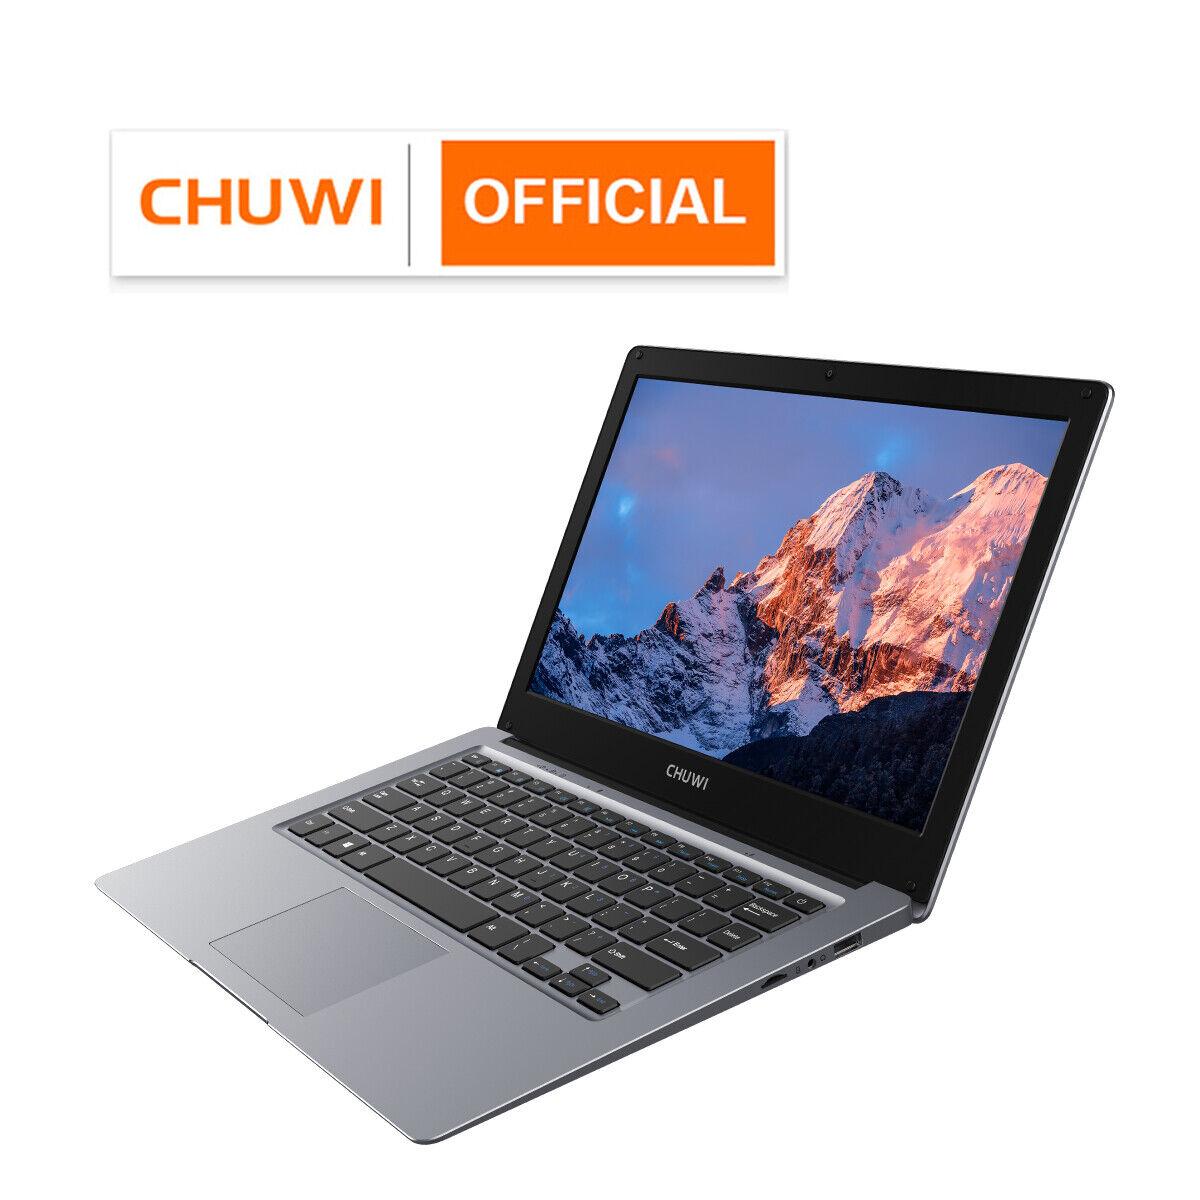 "Laptop Windows - CHUWI HeroBook Pro+ 13.3"" Laptop Windows 3200*1800 Intel Celeron J3455 PC 8+128G"